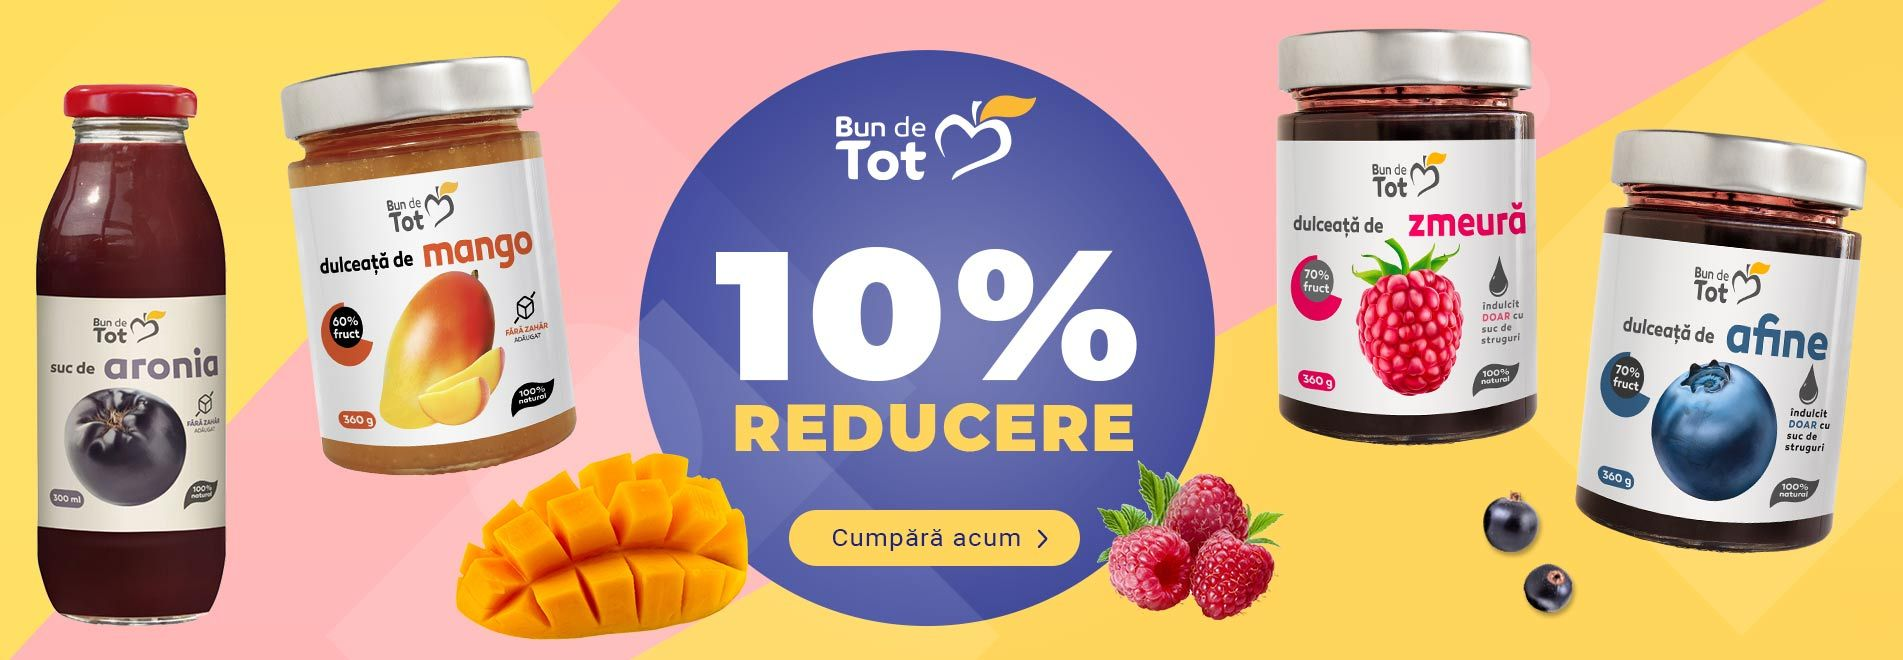 https://www.daciaplant.ro/categorii-produse/brand/bun-de-tot.html